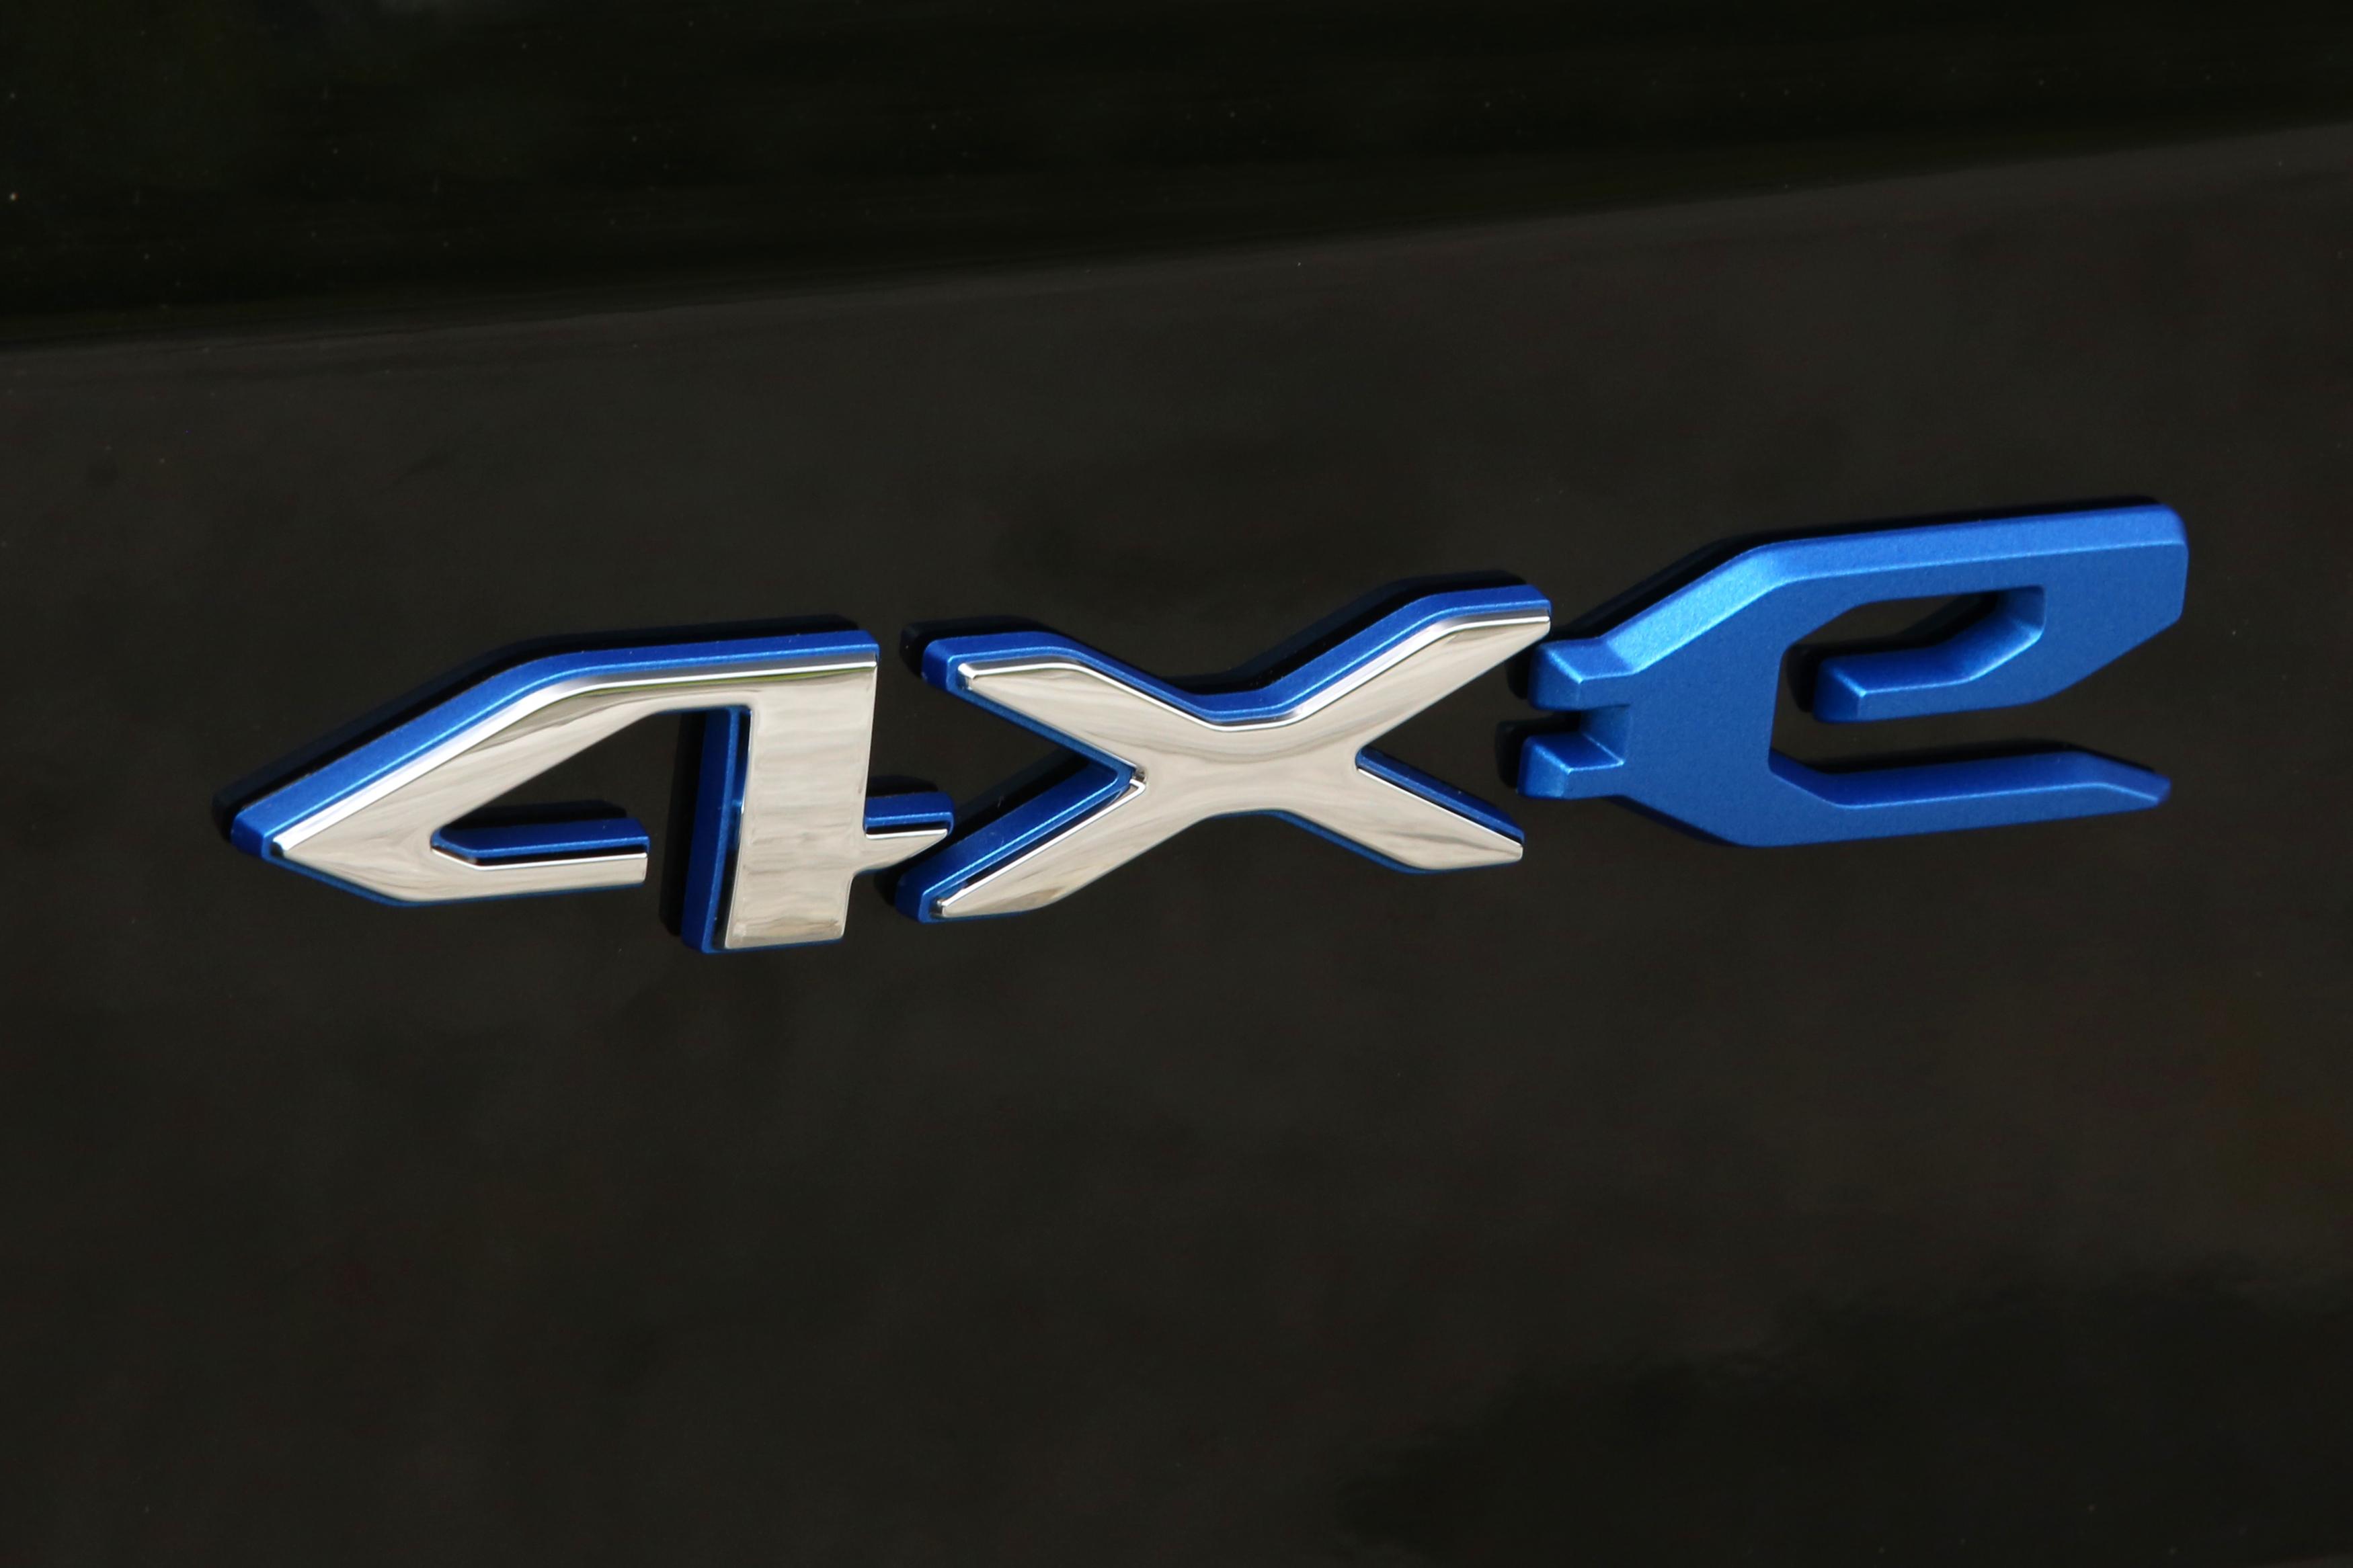 New 4xe badge